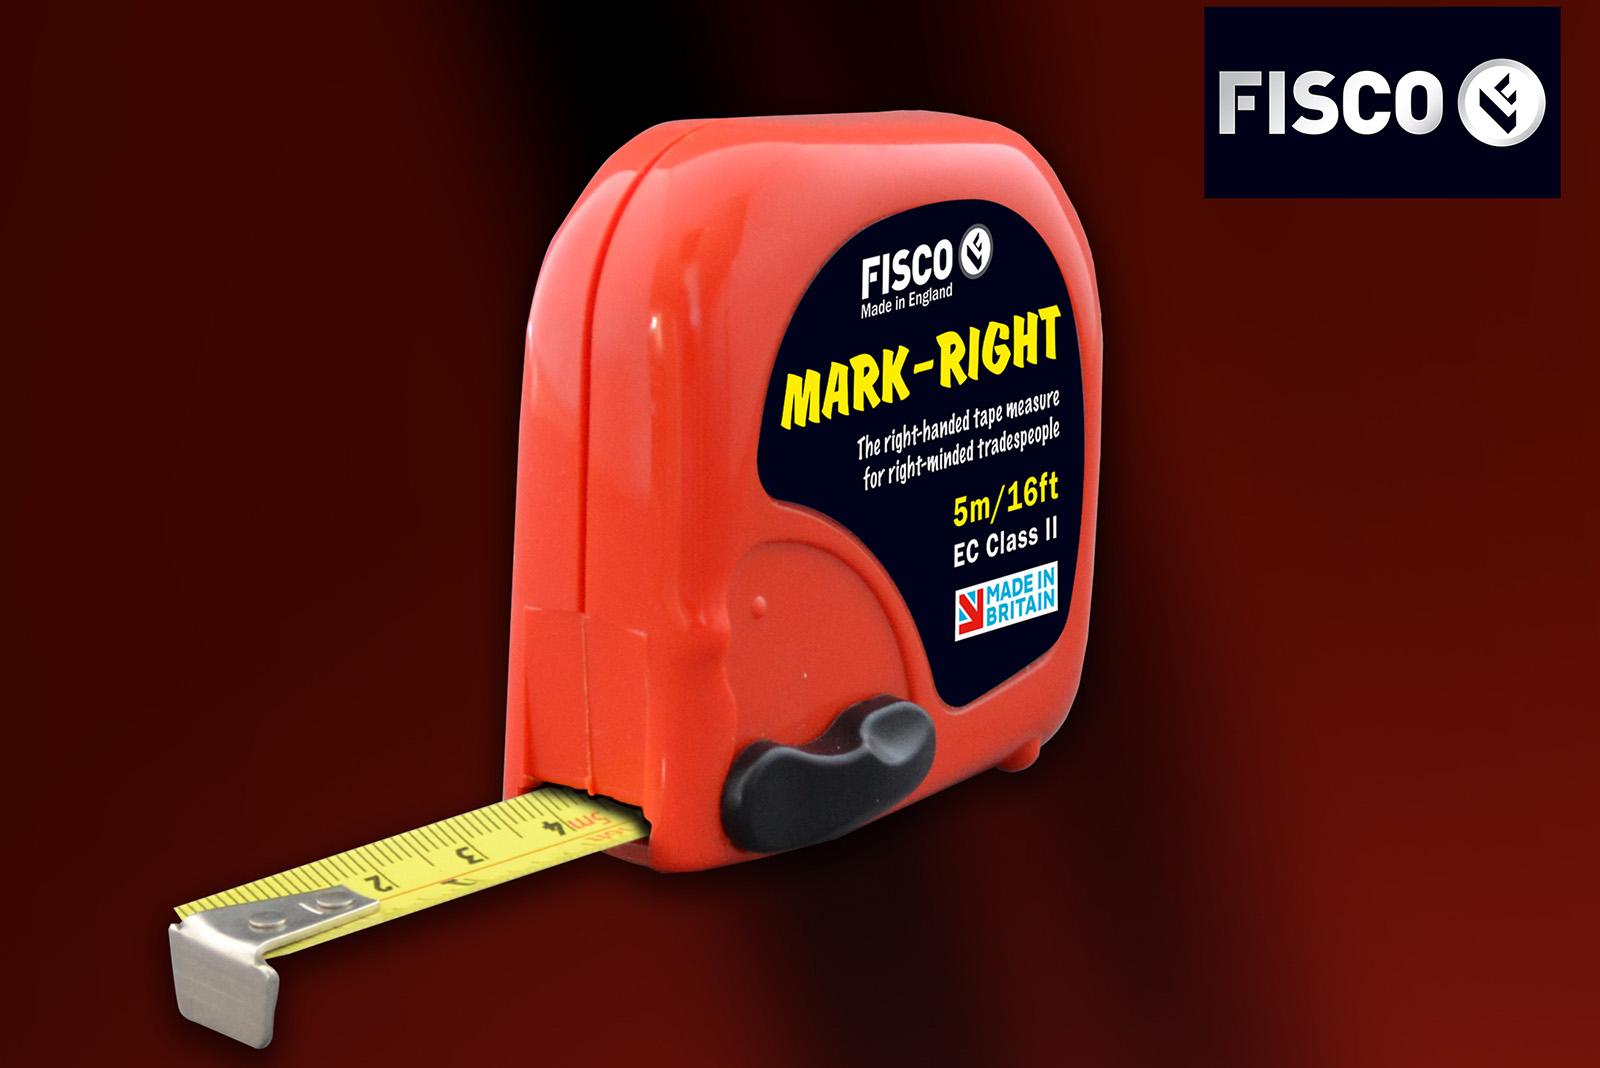 Fisco's new 'Mark-Right' measuring tape